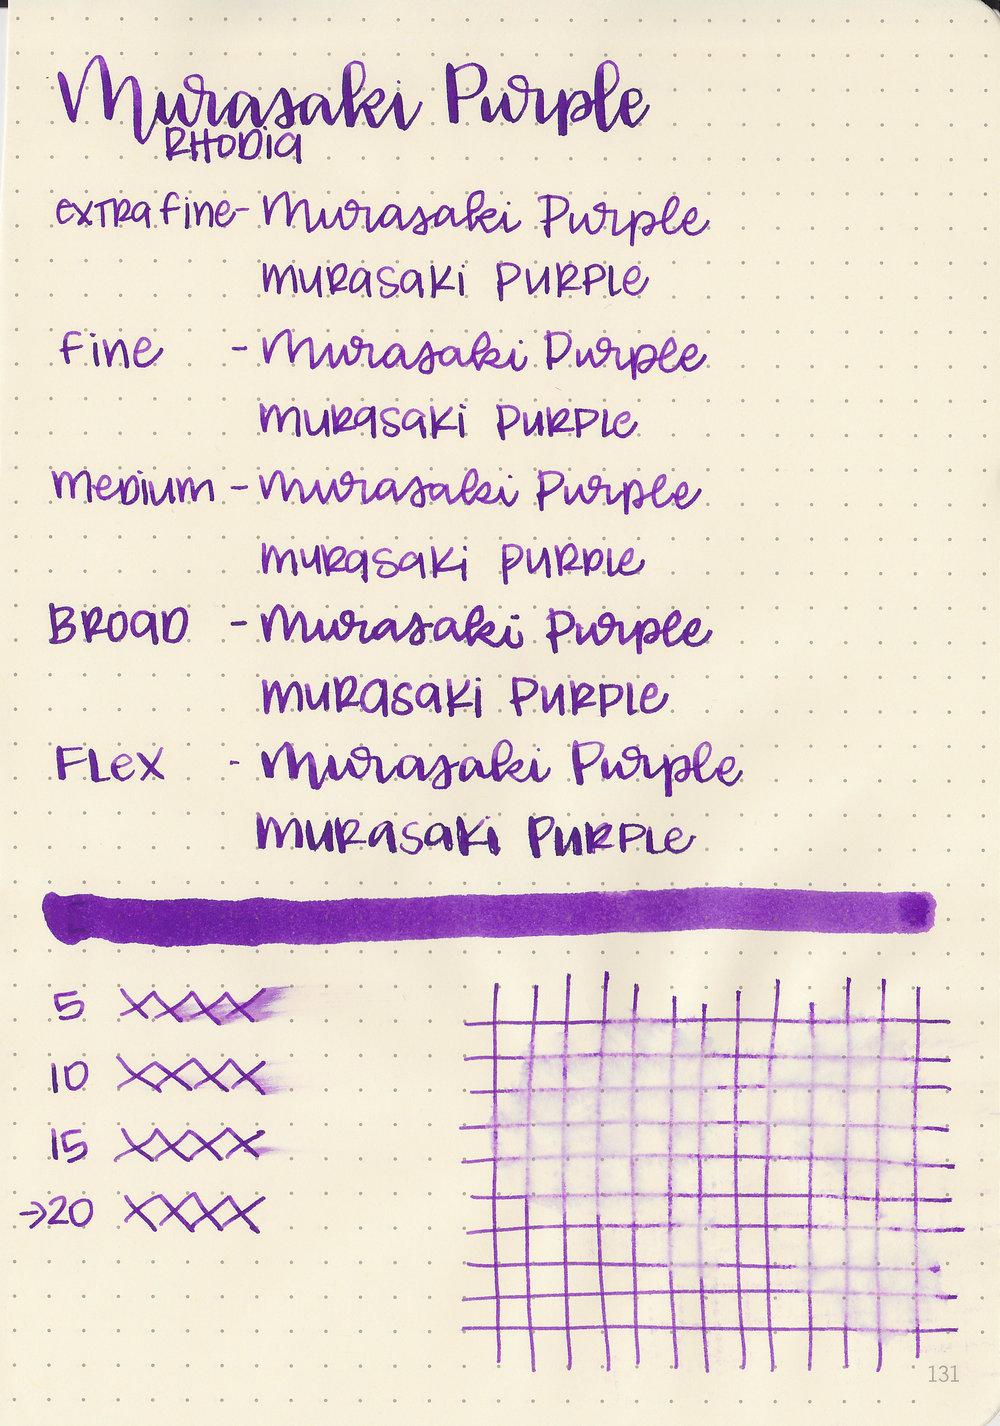 tac-murasaki-purple-7.jpg